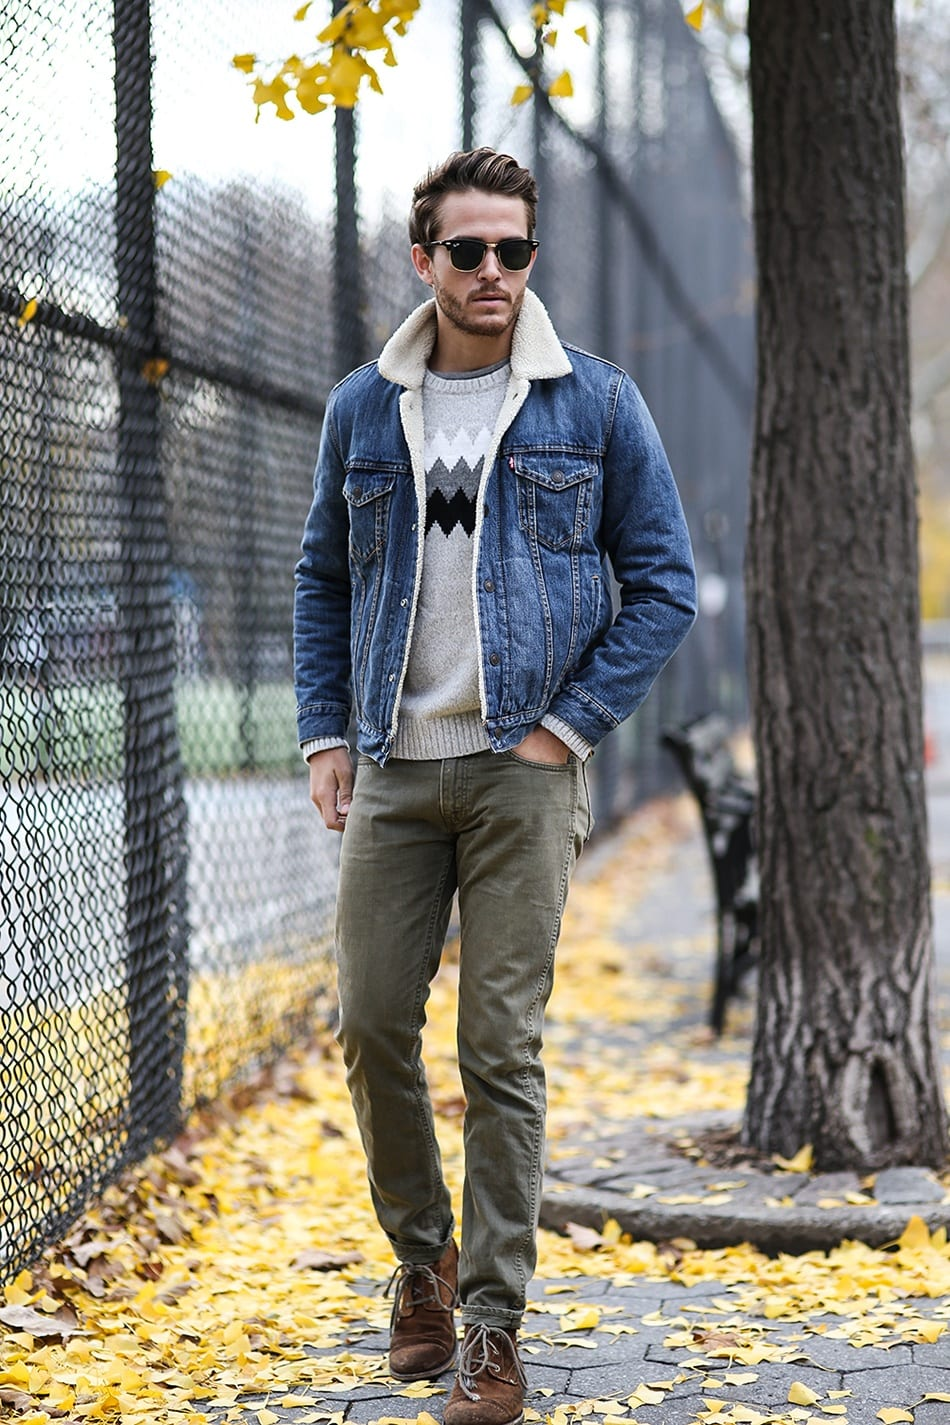 Men Shearling Jacket Outfits-22 Ways To Wear Shearling Jacket